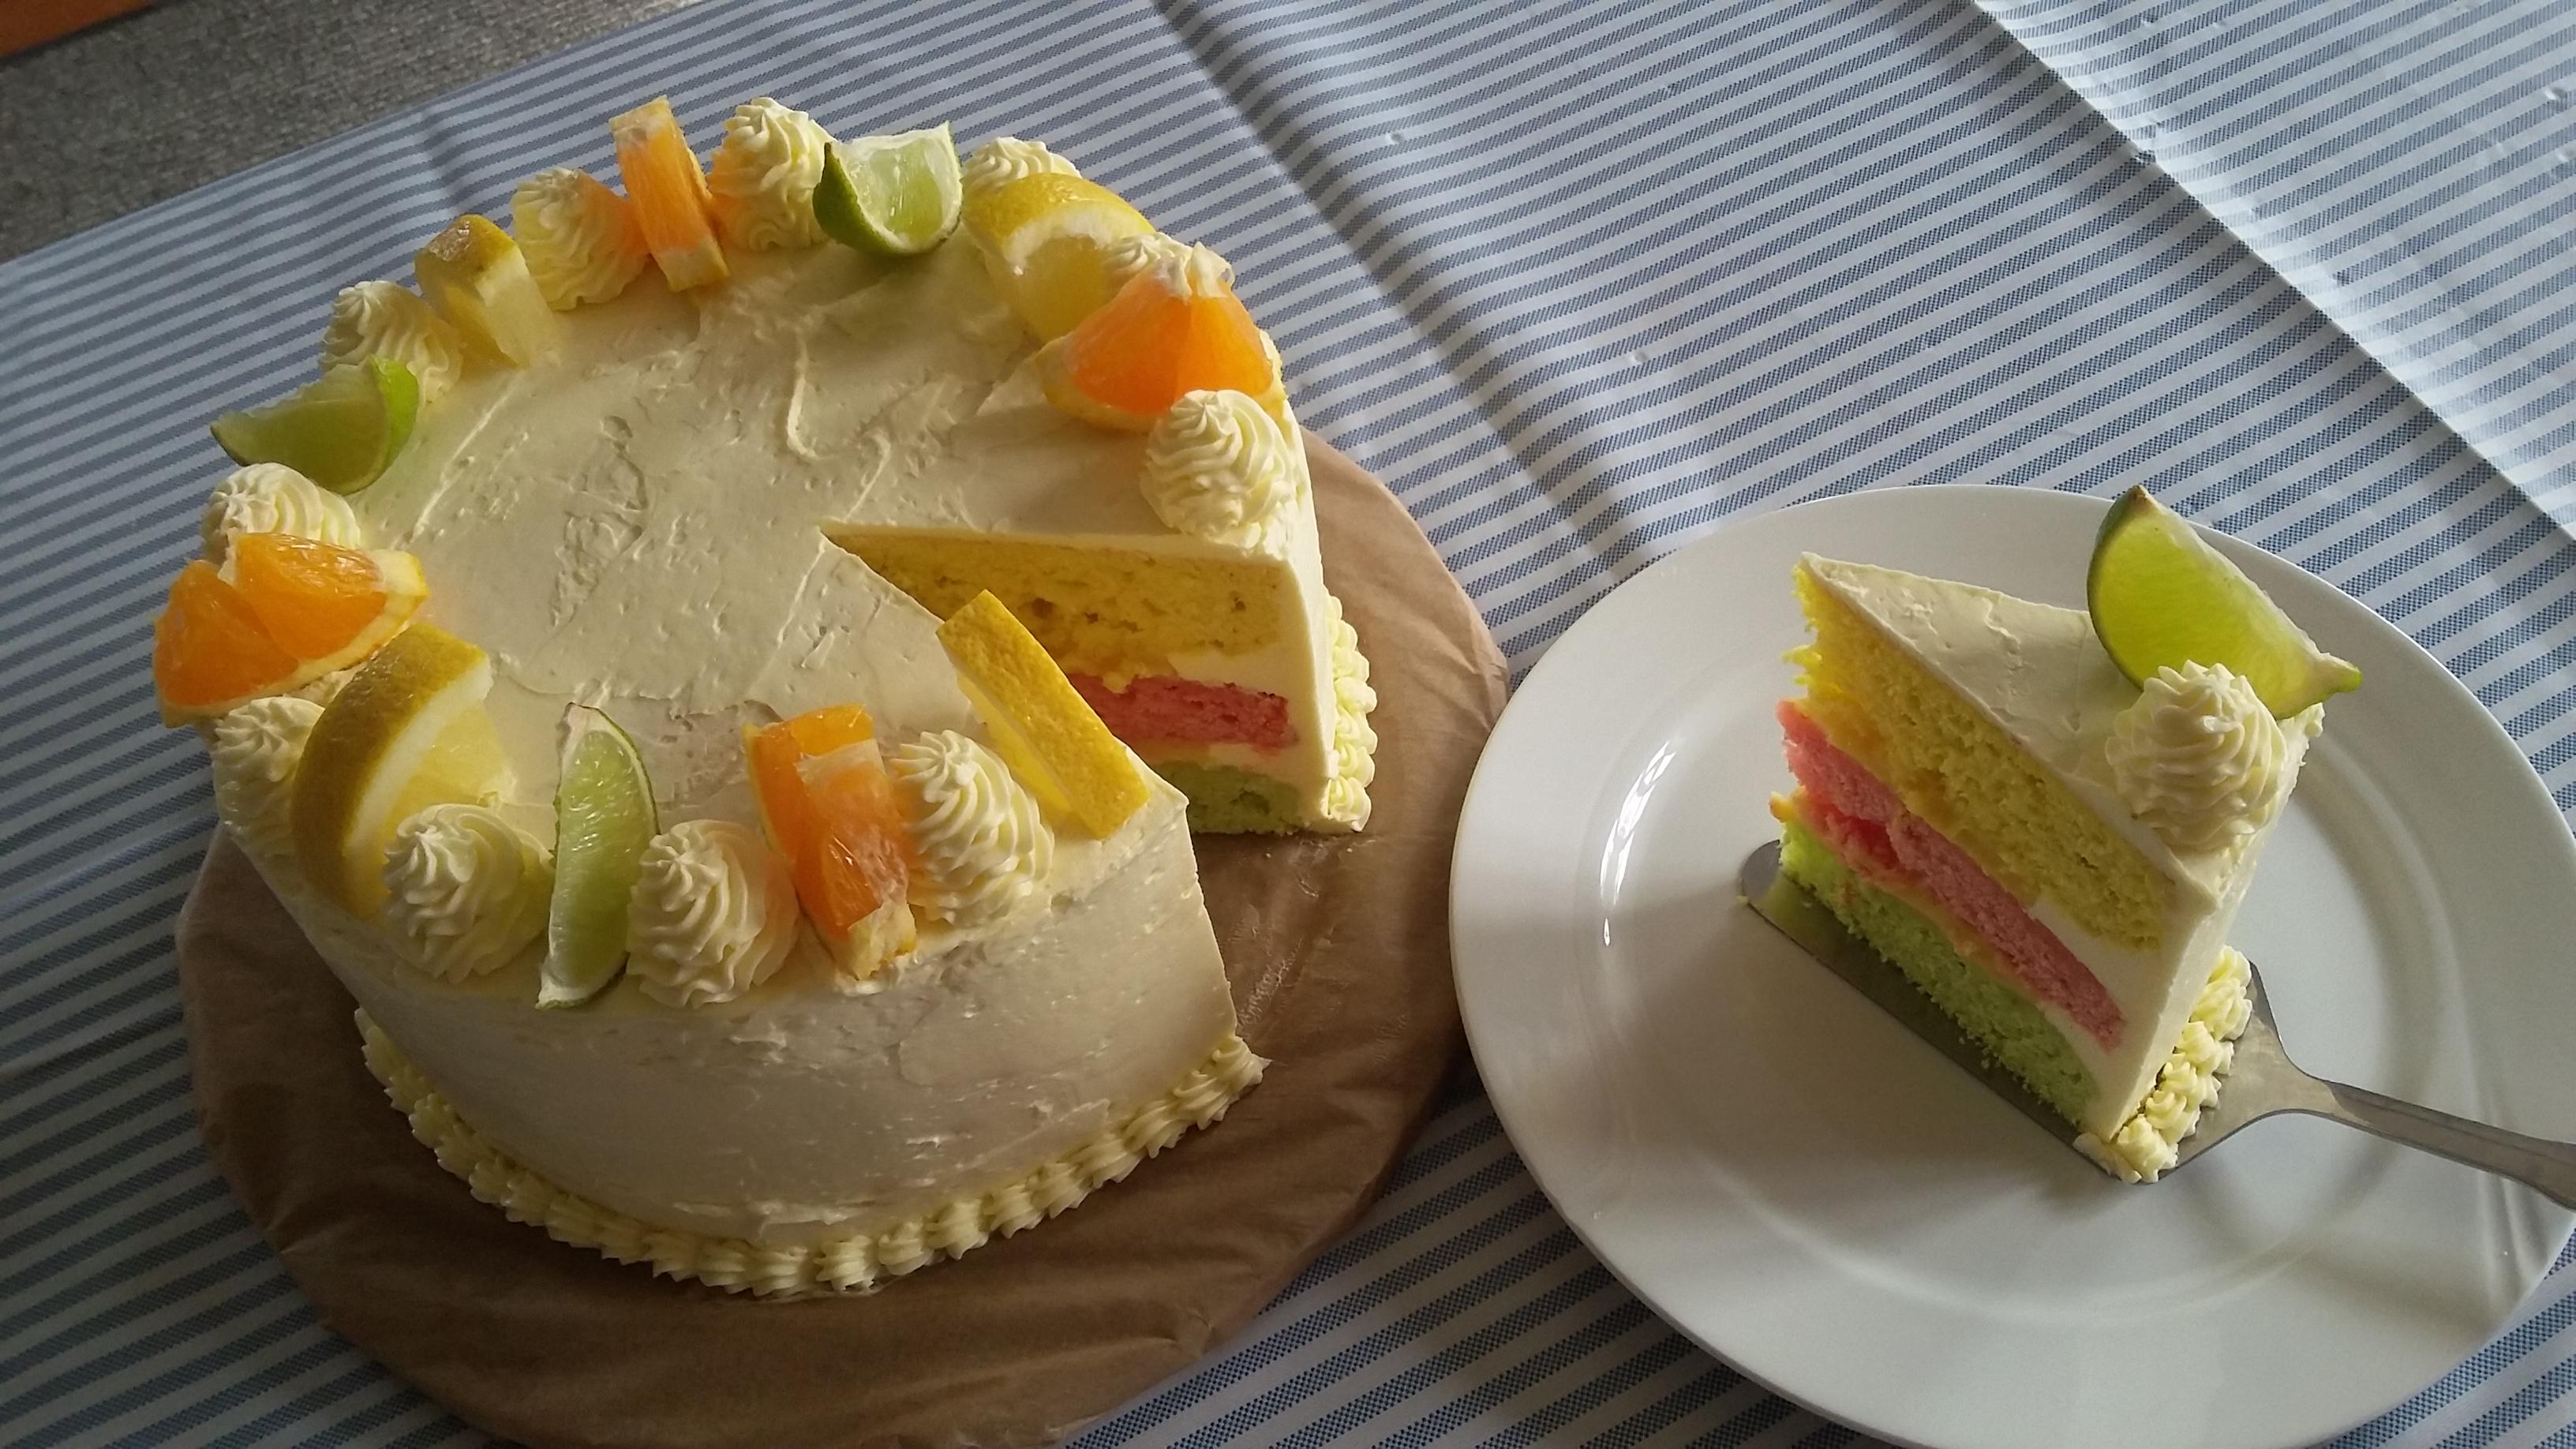 Rainbow Citrus Cake Alyanah Torres Remocal